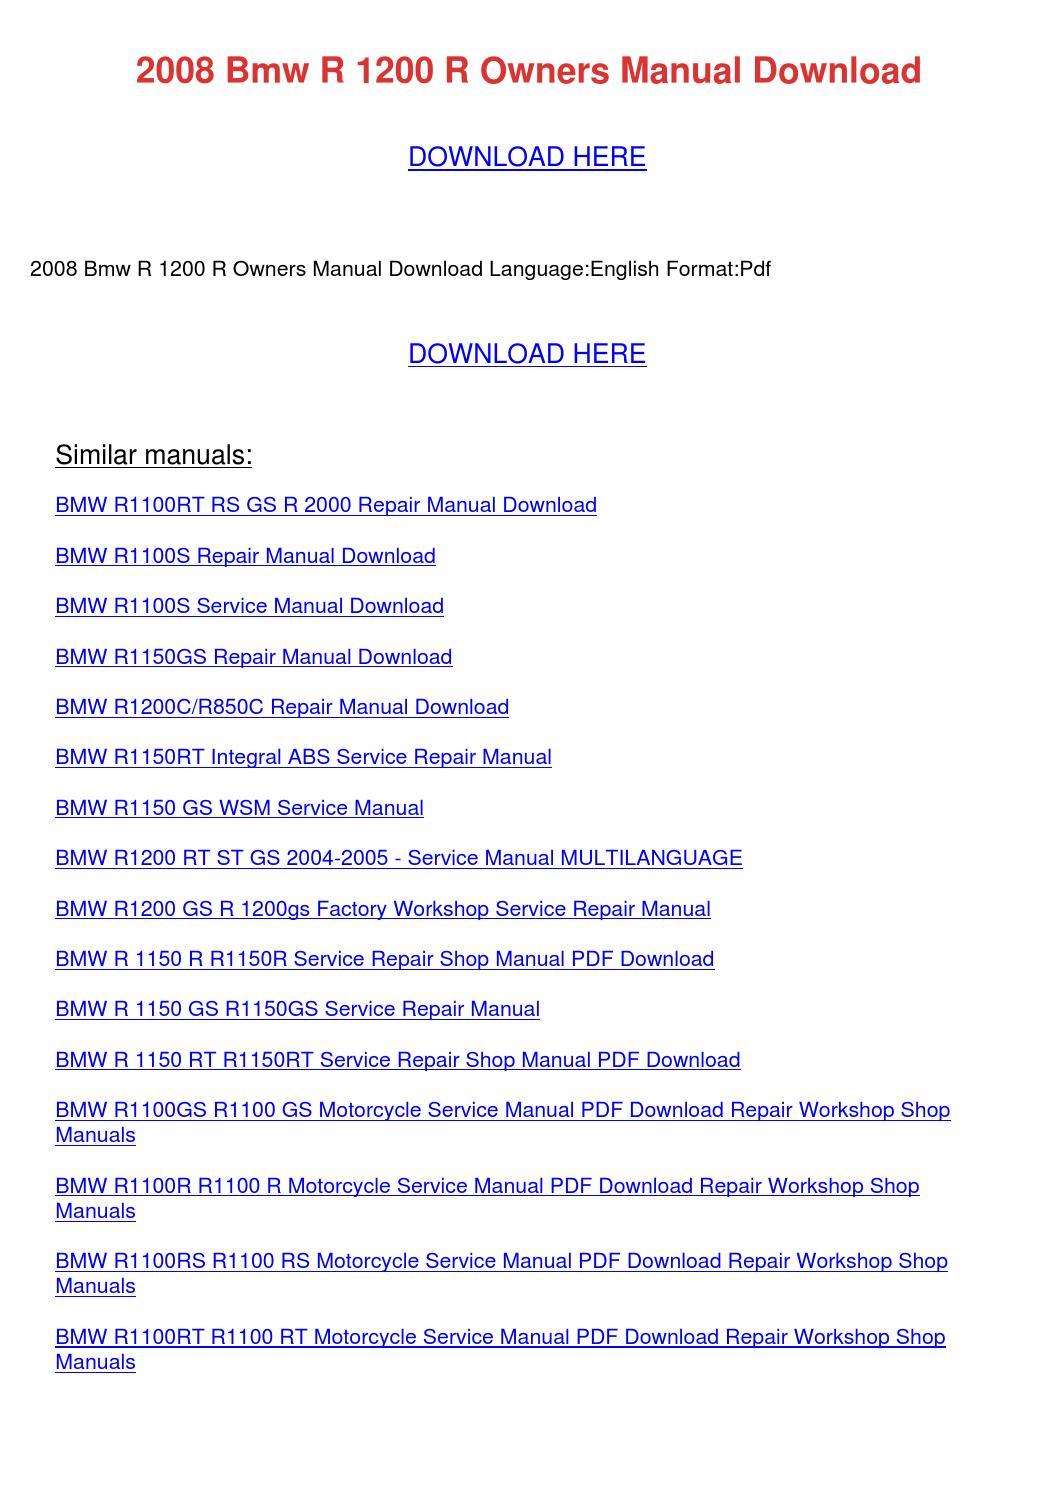 2008 Bmw R 1200 R Owners Manual Download By Joseherrington Issuu